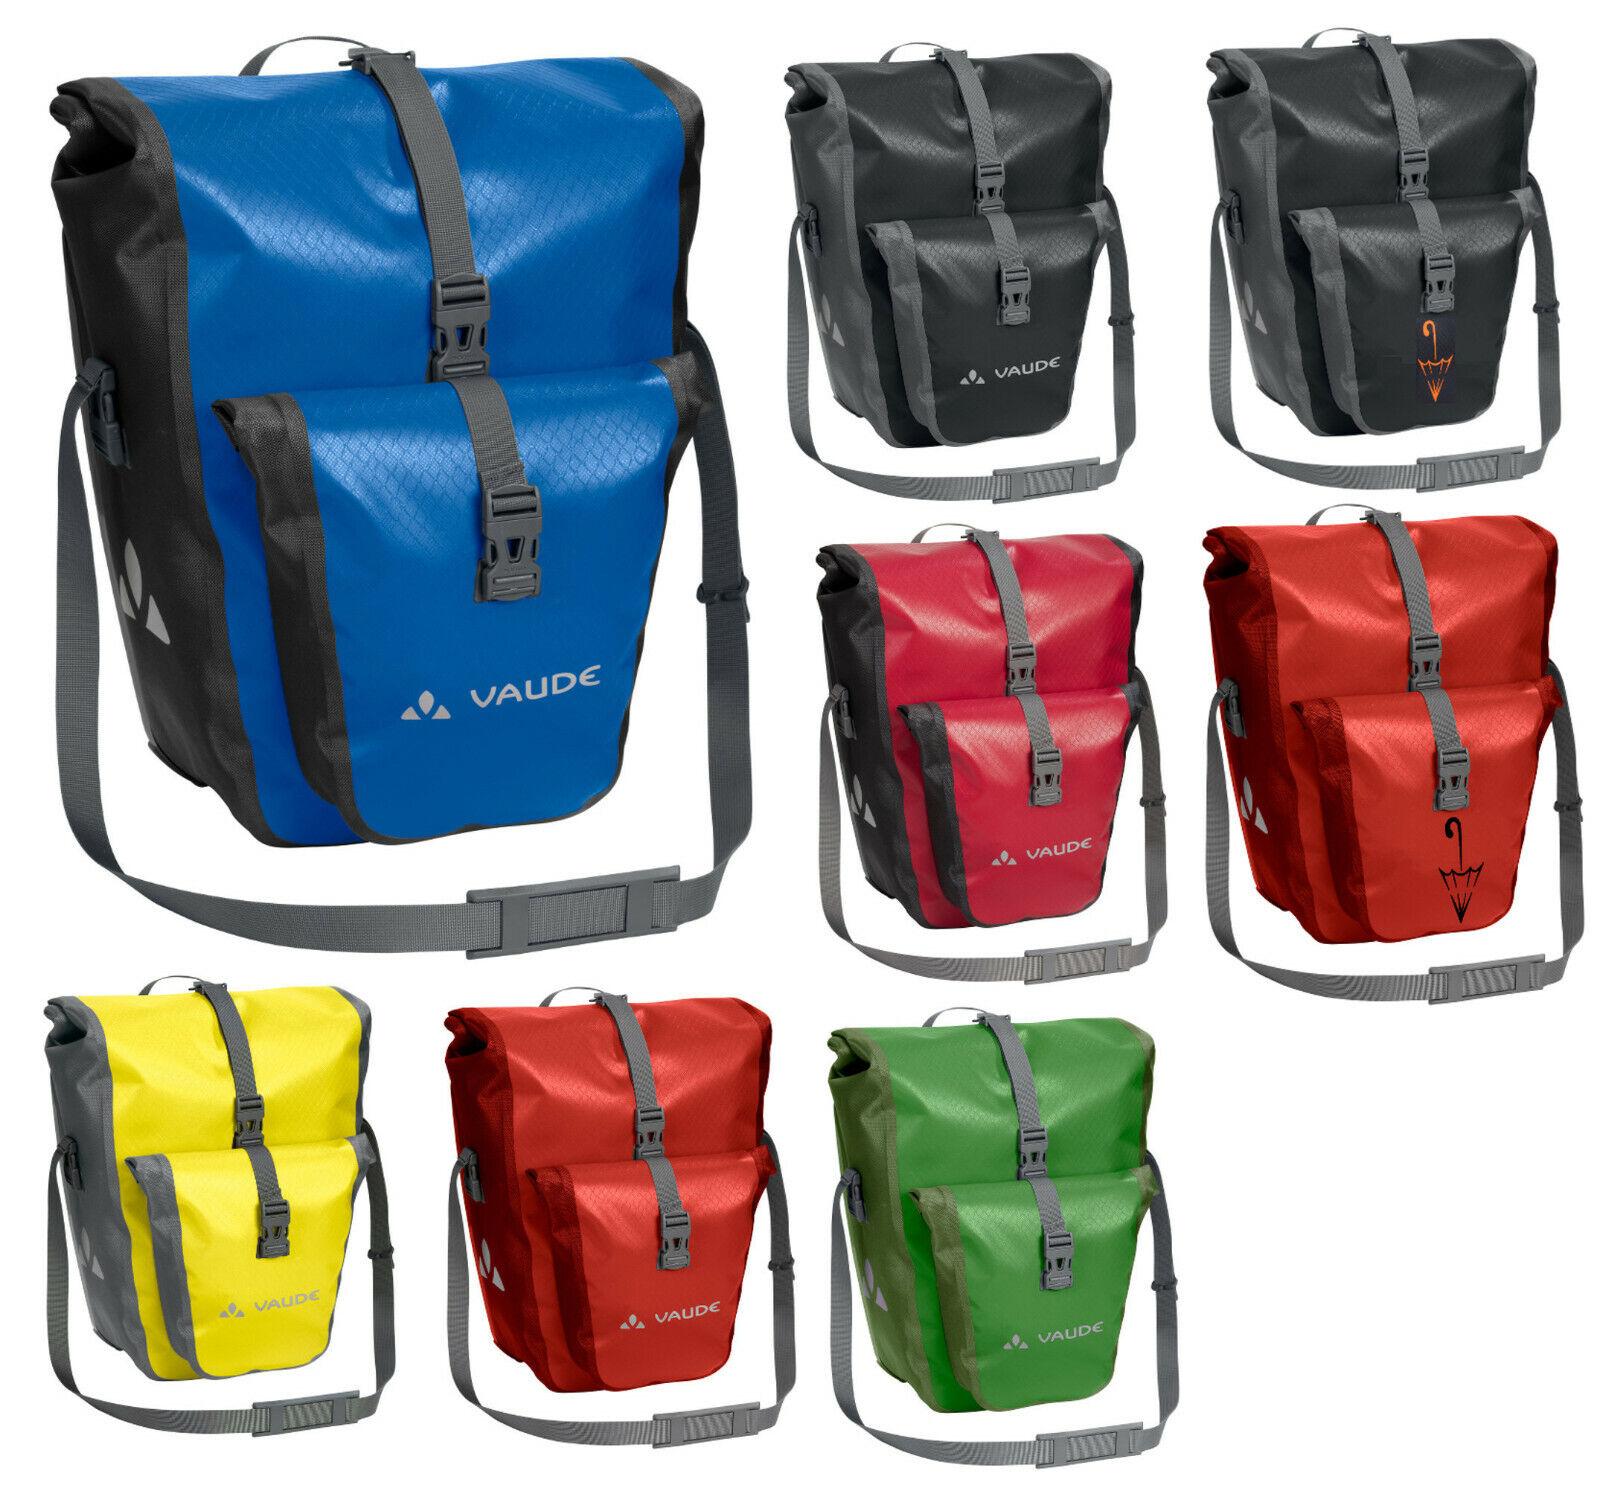 vaude Aqua Back Single Fahrradtache eine Radtasche Gepäckträgertasche